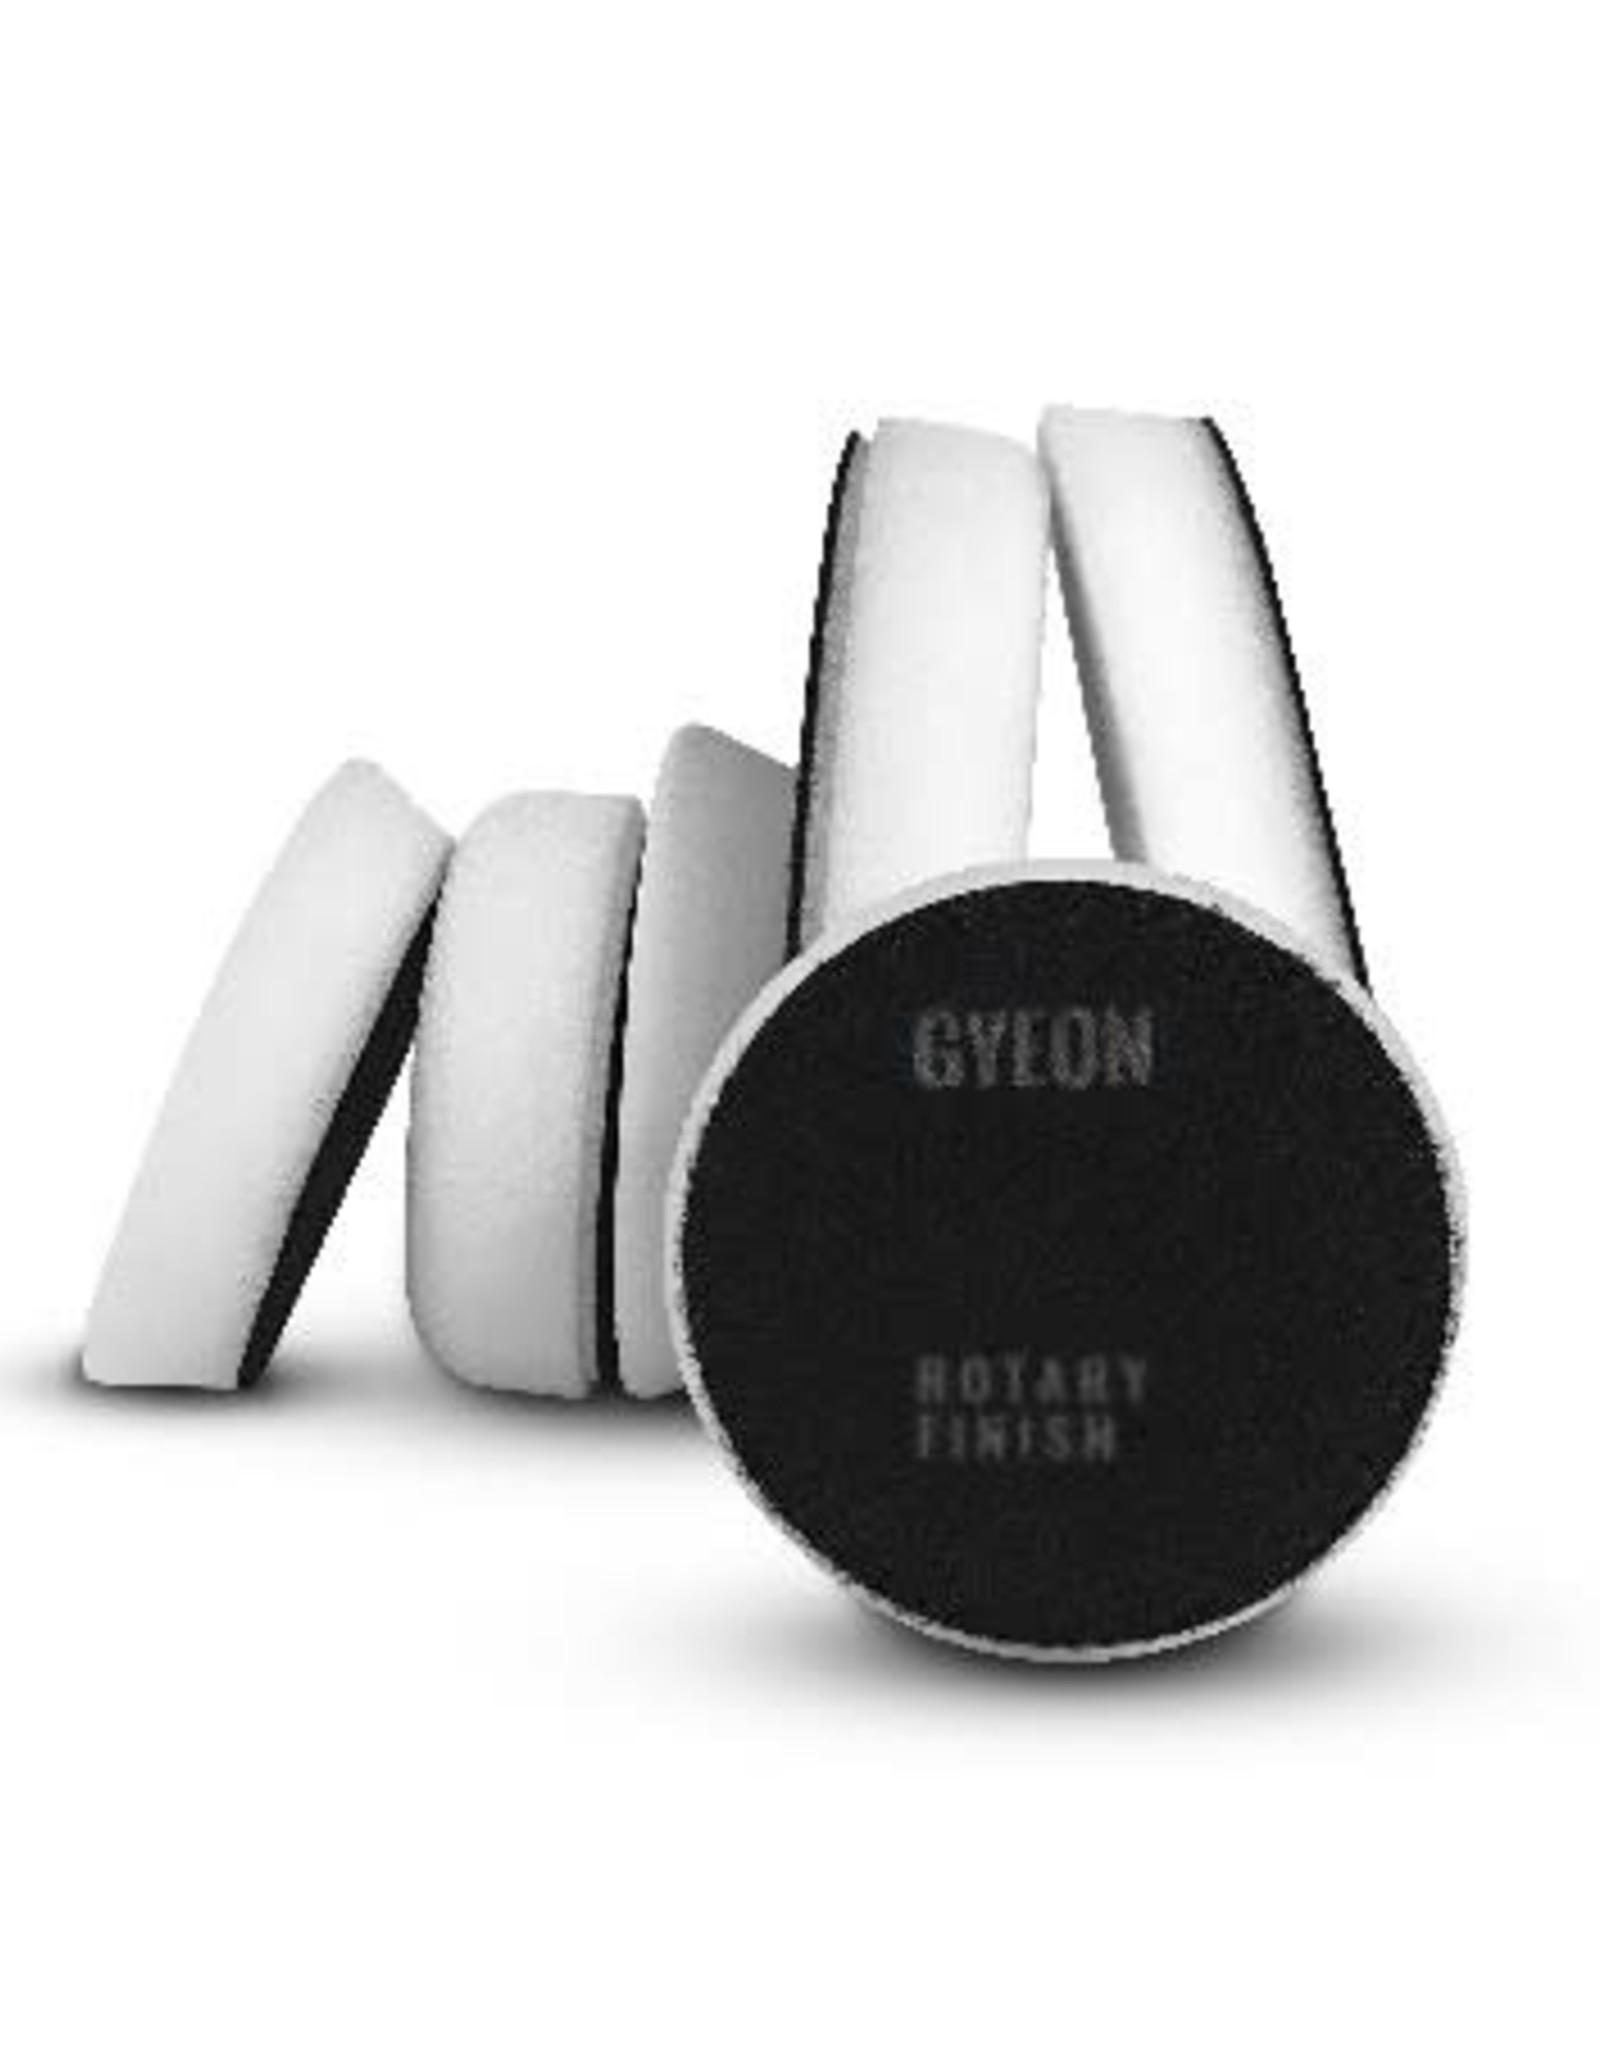 Gyeon Gyeon Q²M Rotary Finish 2-pack 80mm x 25mm